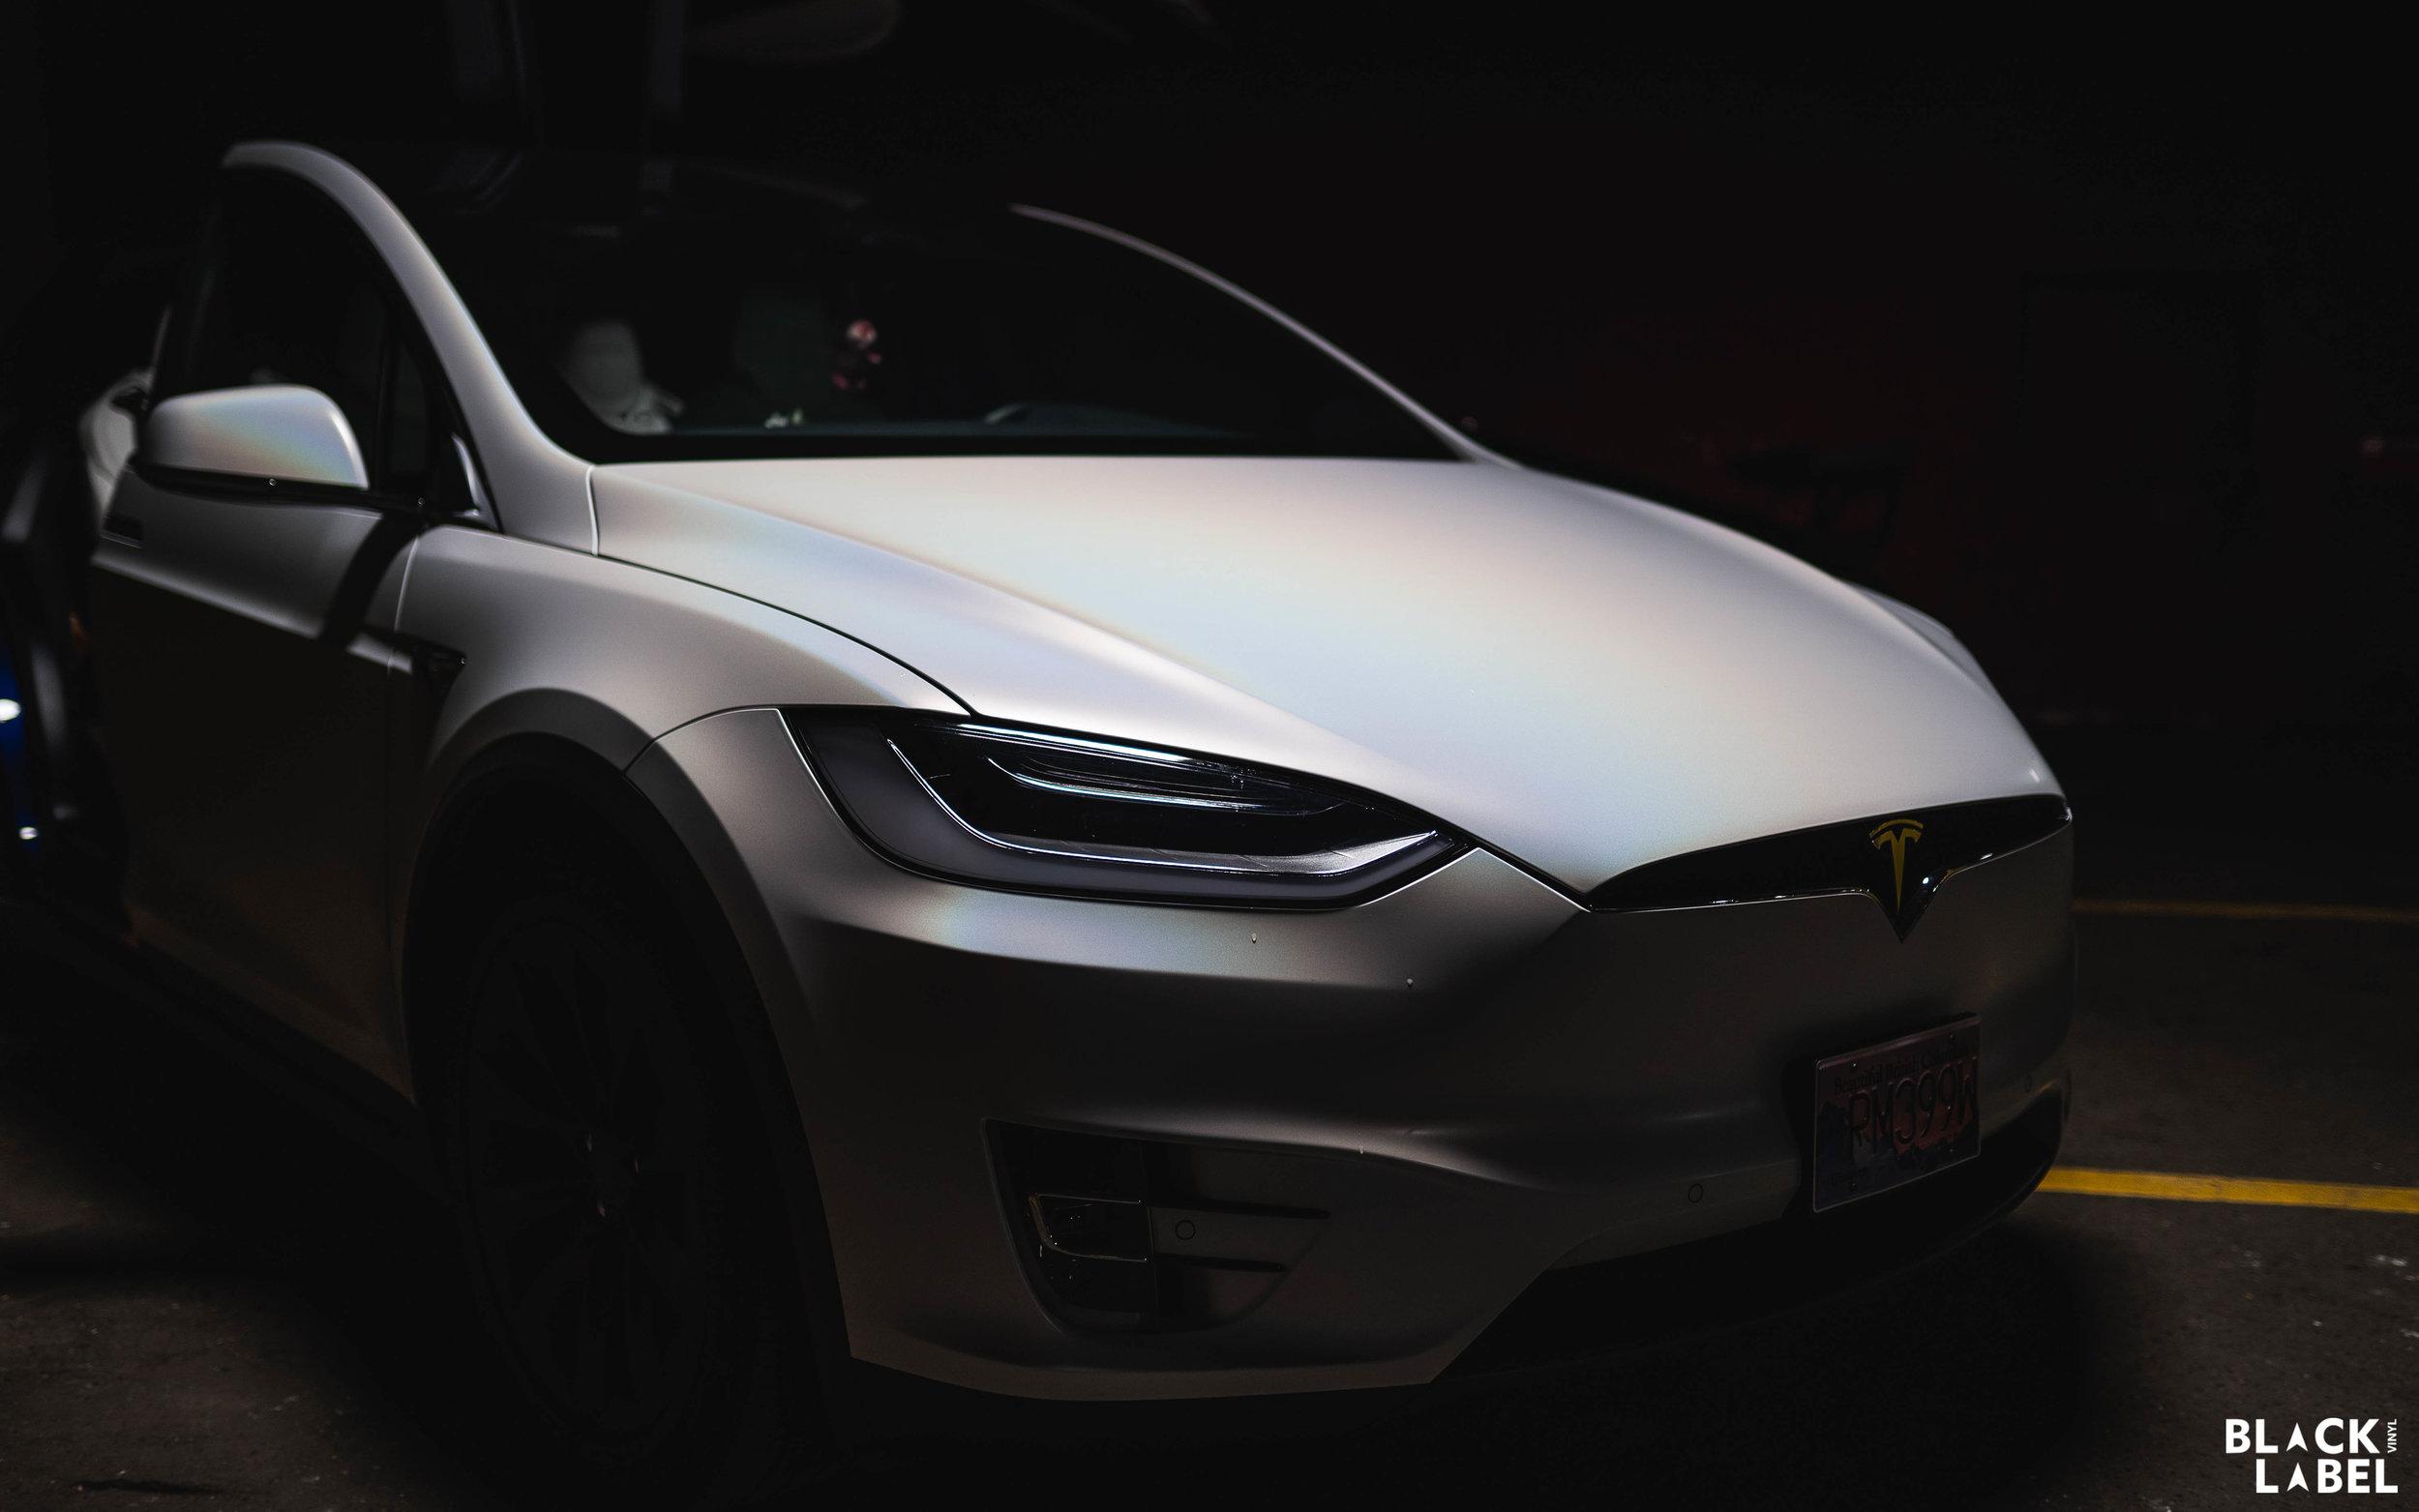 Tesla Model X Exterior Color Change in Satin Ghost Flip